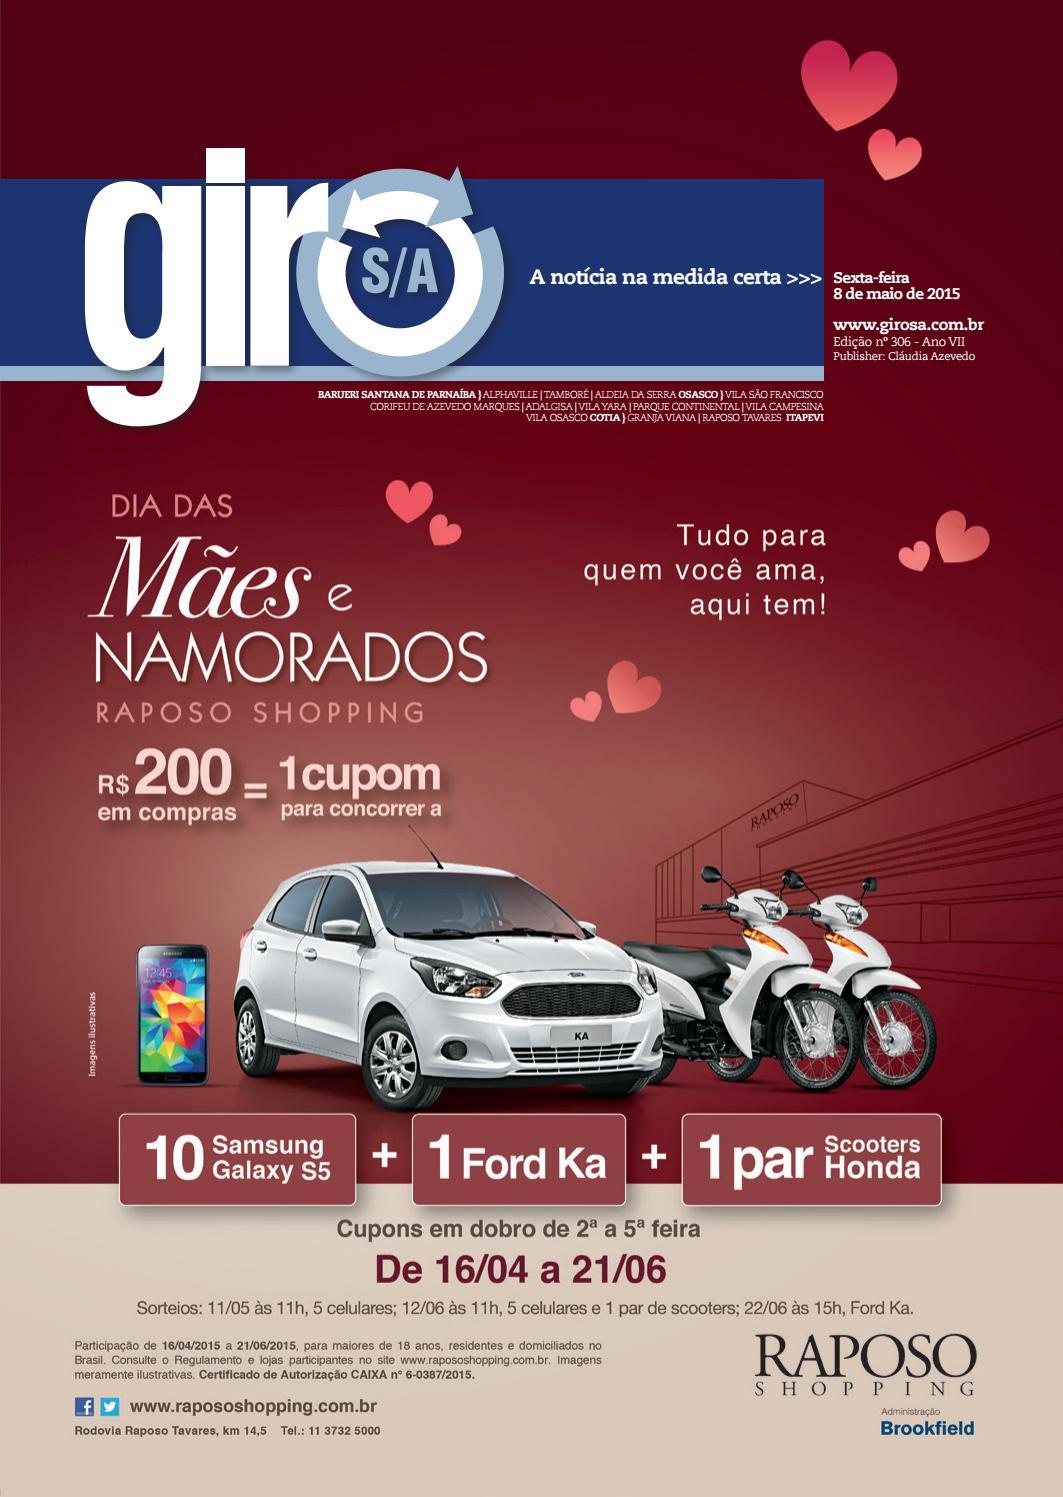 ced3cacc70f Edição - 306 by Giro S A - issuu